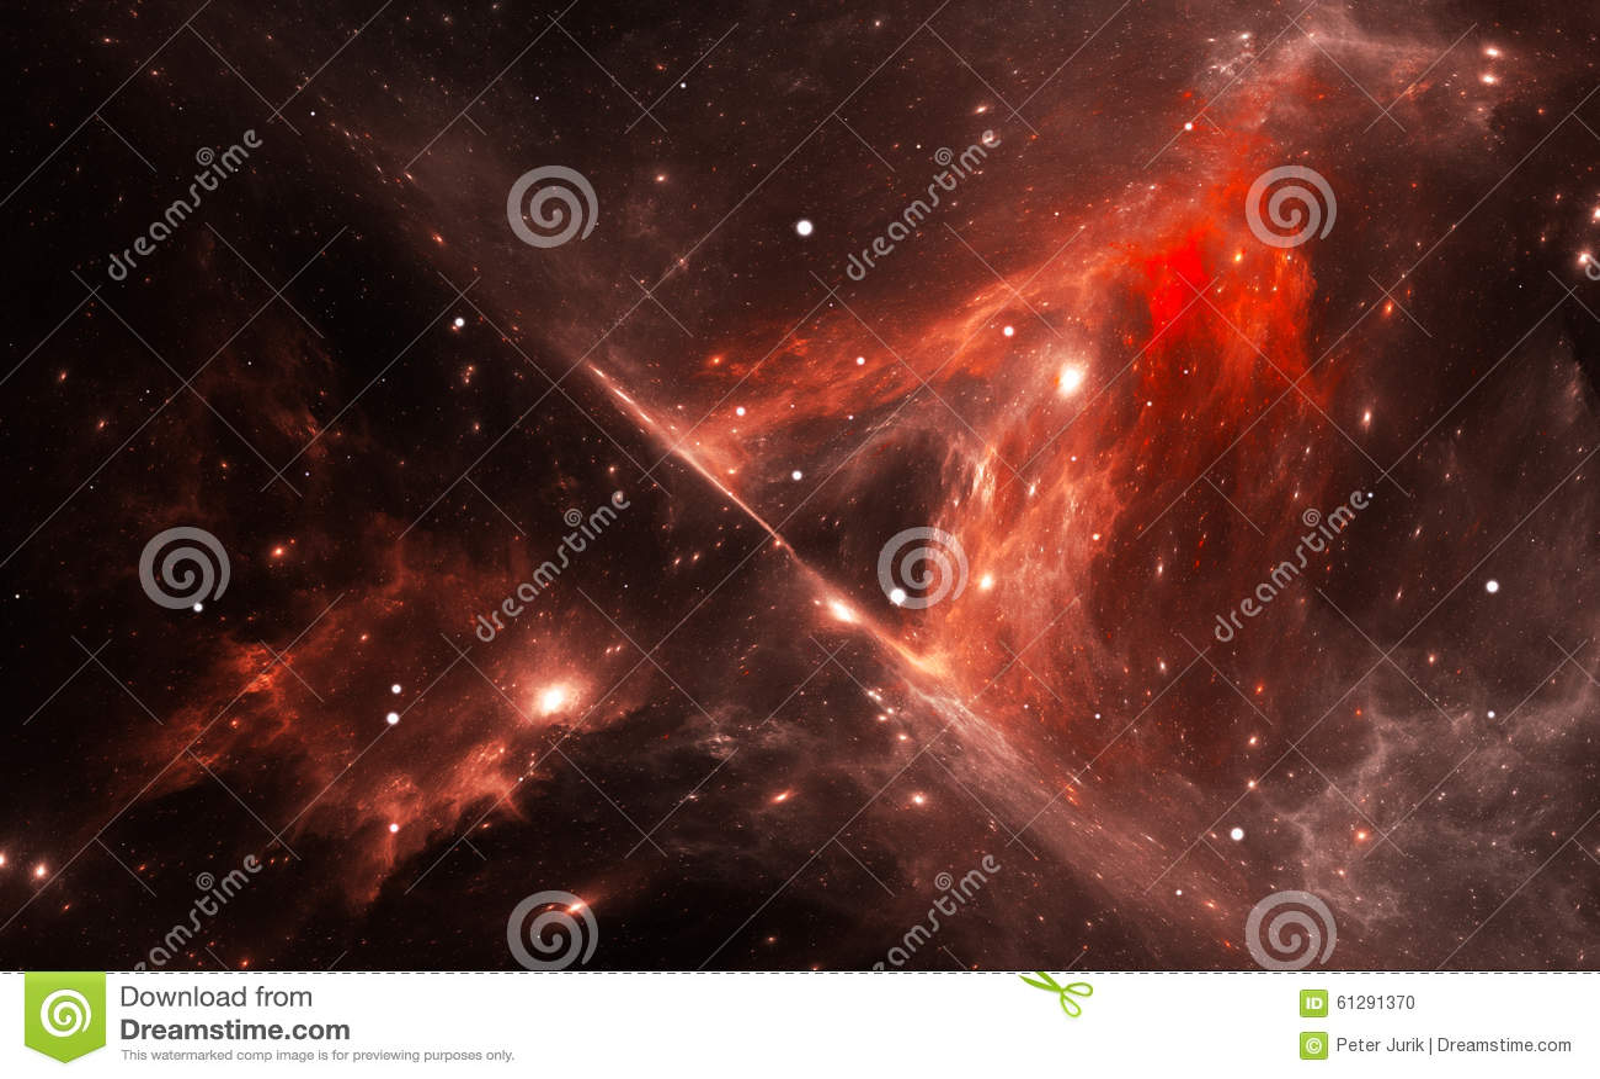 space nebula red - photo #30